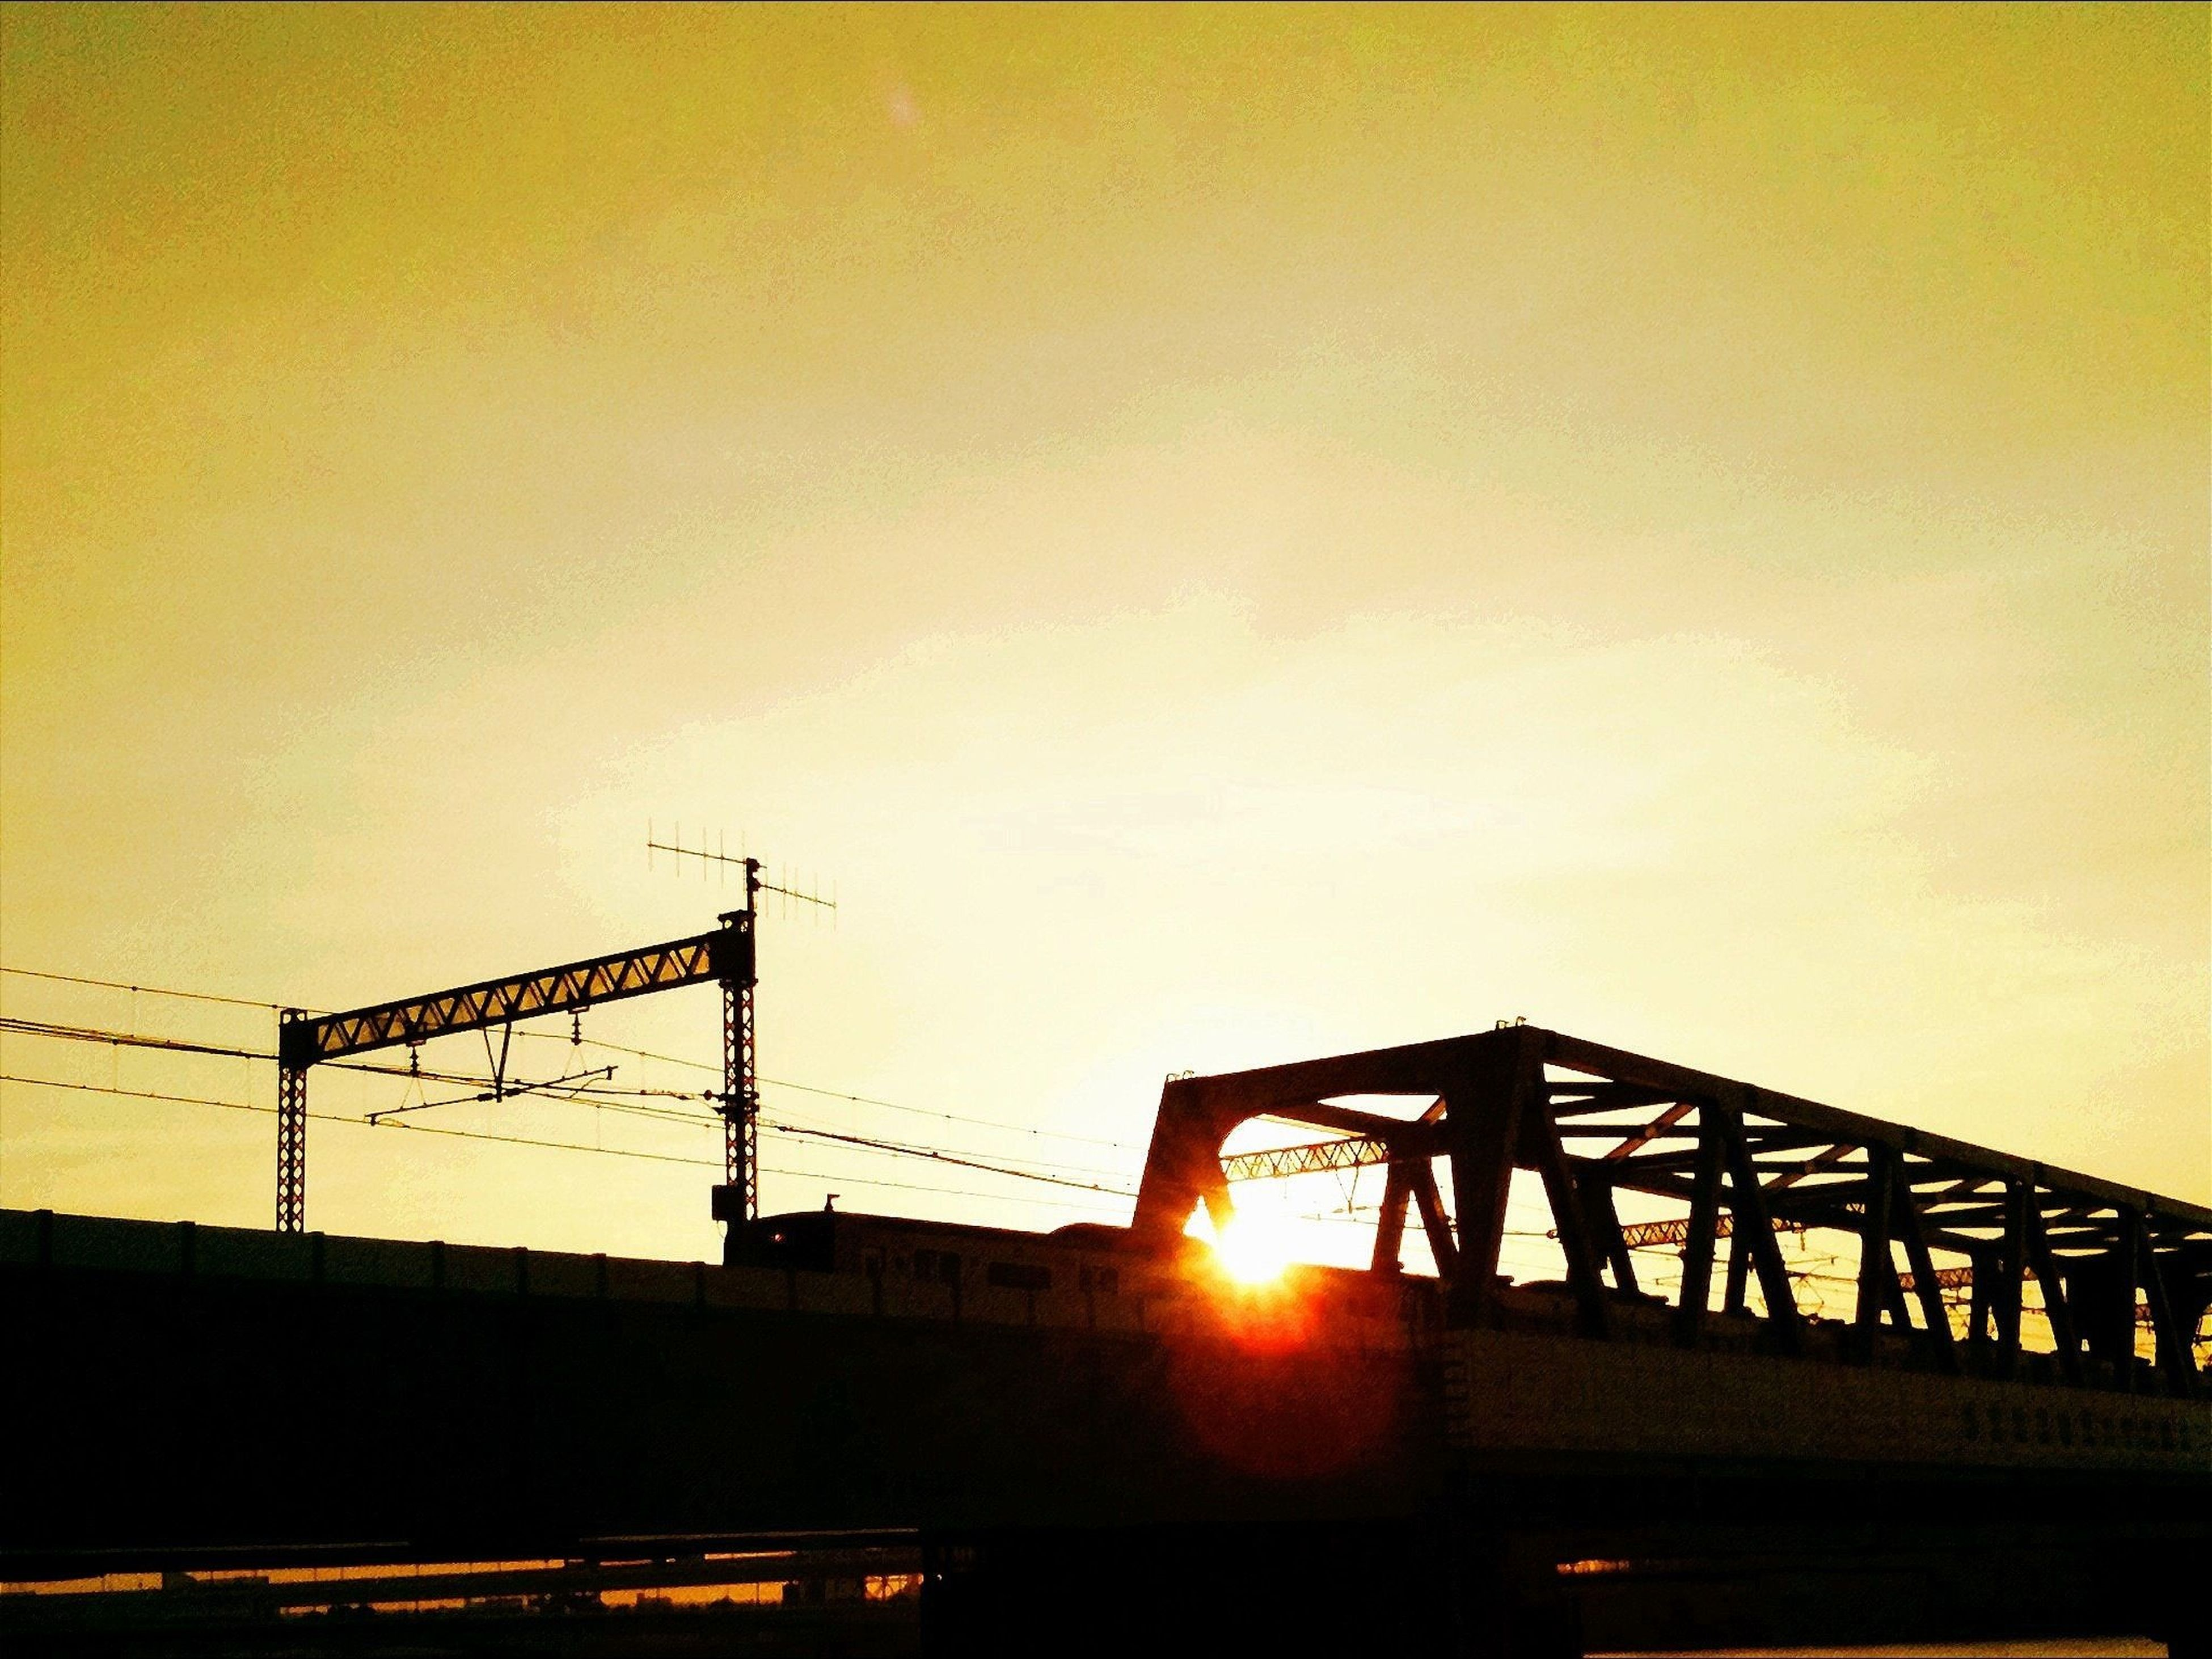 sunset, transportation, connection, bridge - man made structure, sun, built structure, architecture, orange color, silhouette, sky, copy space, engineering, bridge, clear sky, railing, sunlight, car, land vehicle, outdoors, road